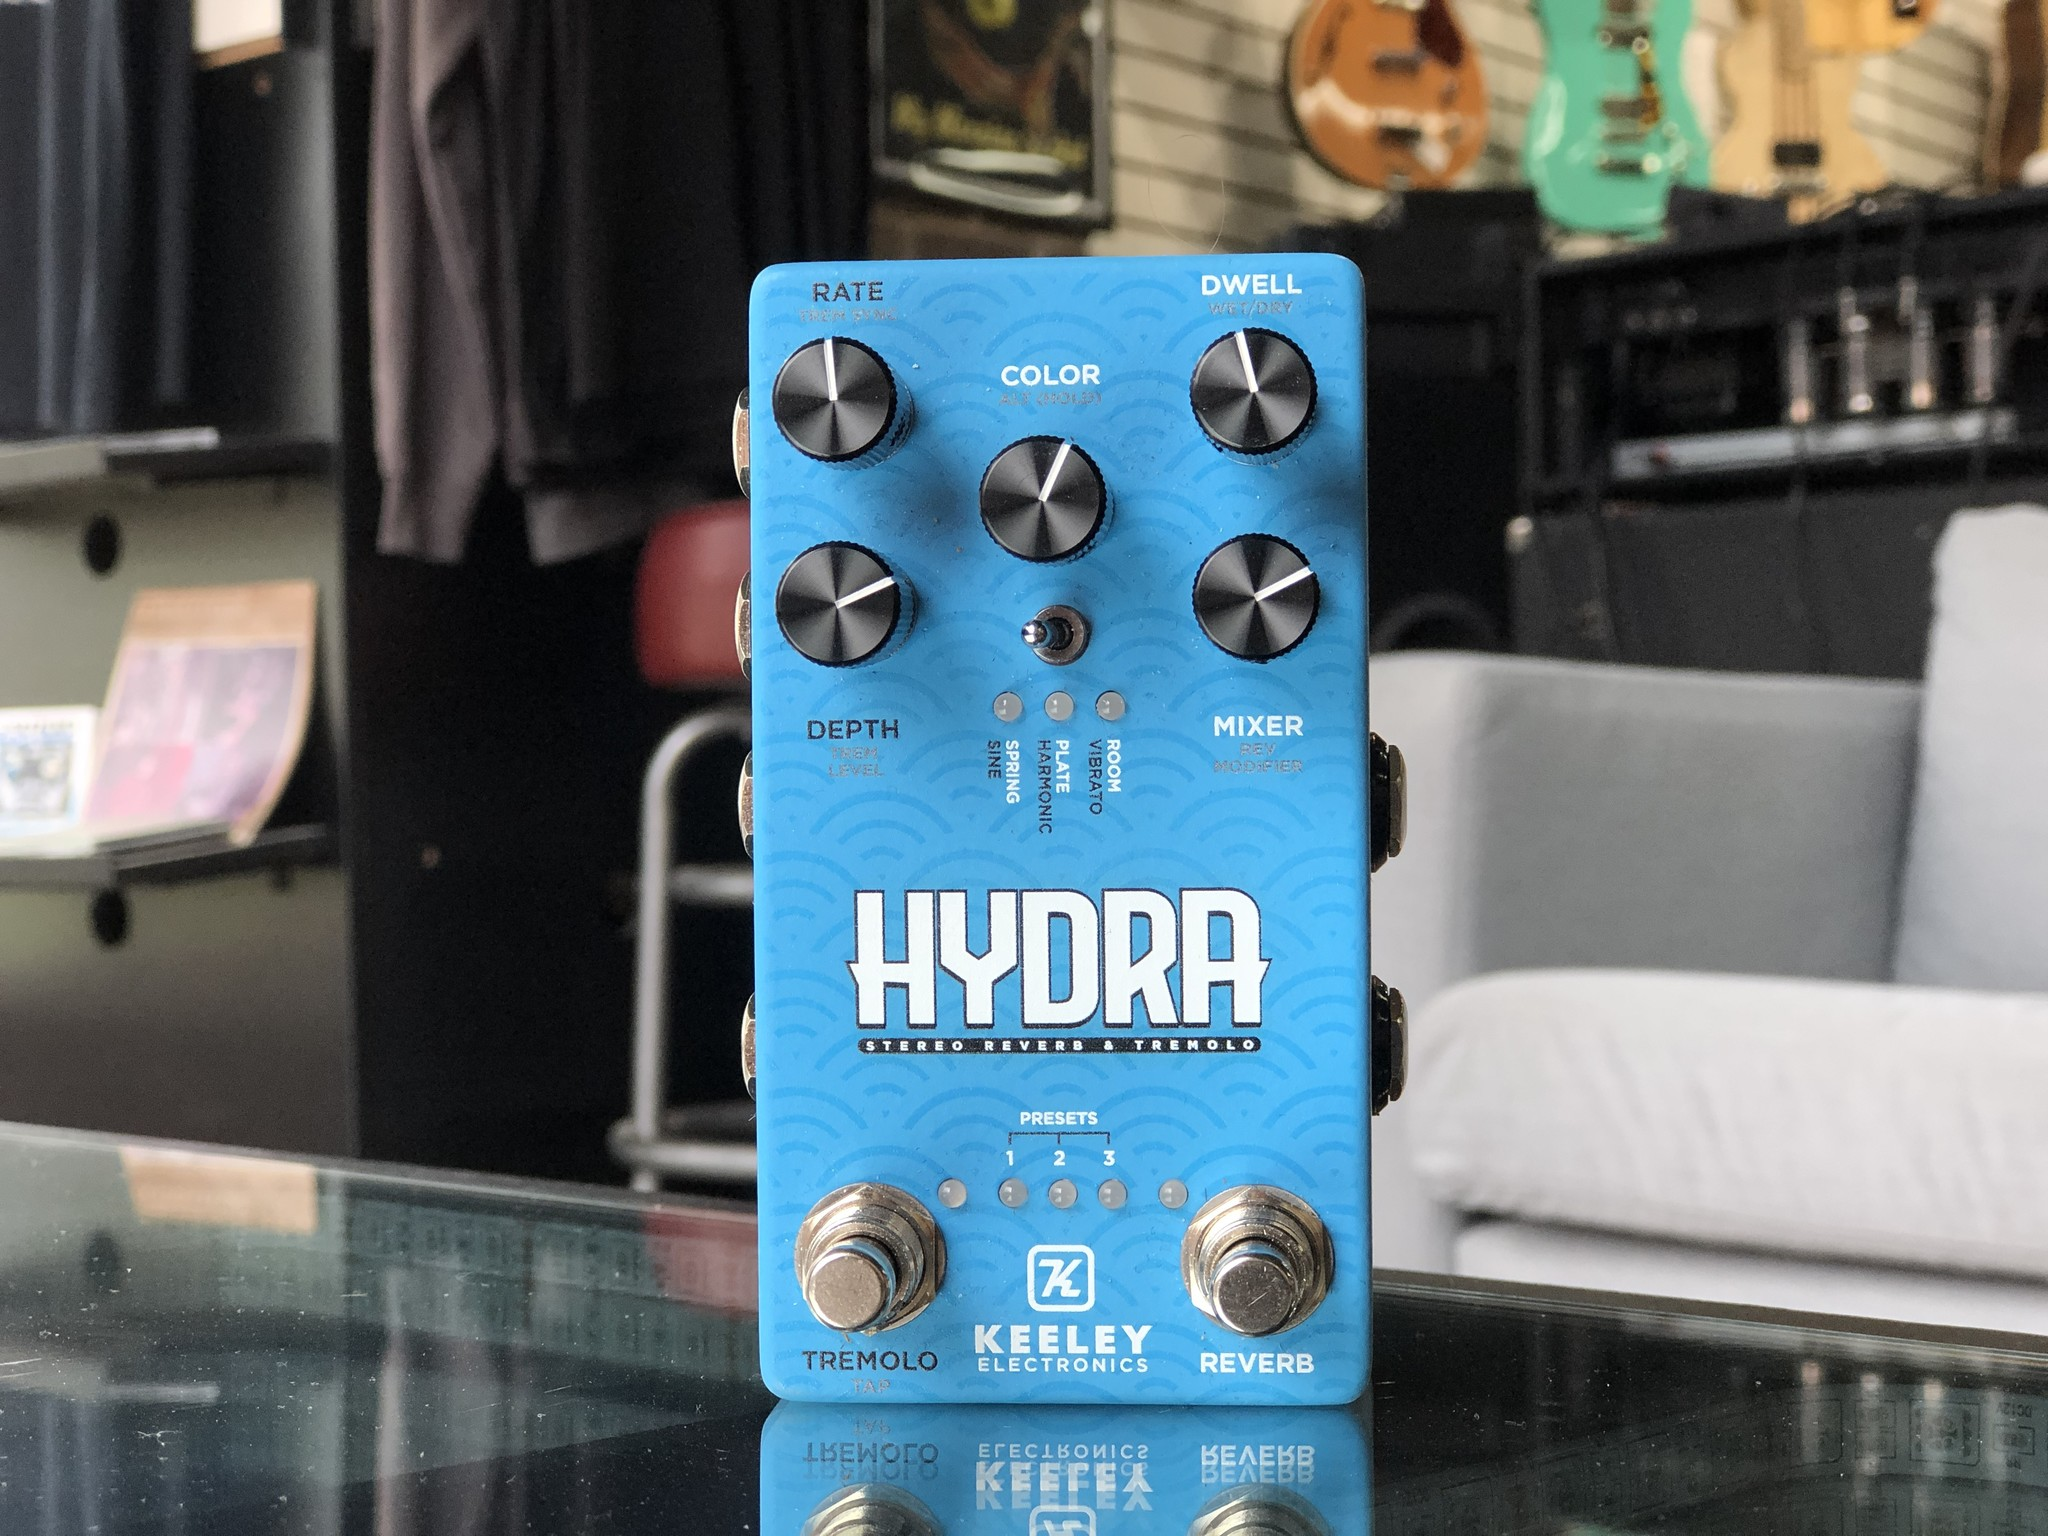 Keeley Hydra Stereo Reverb & Tremolo-1